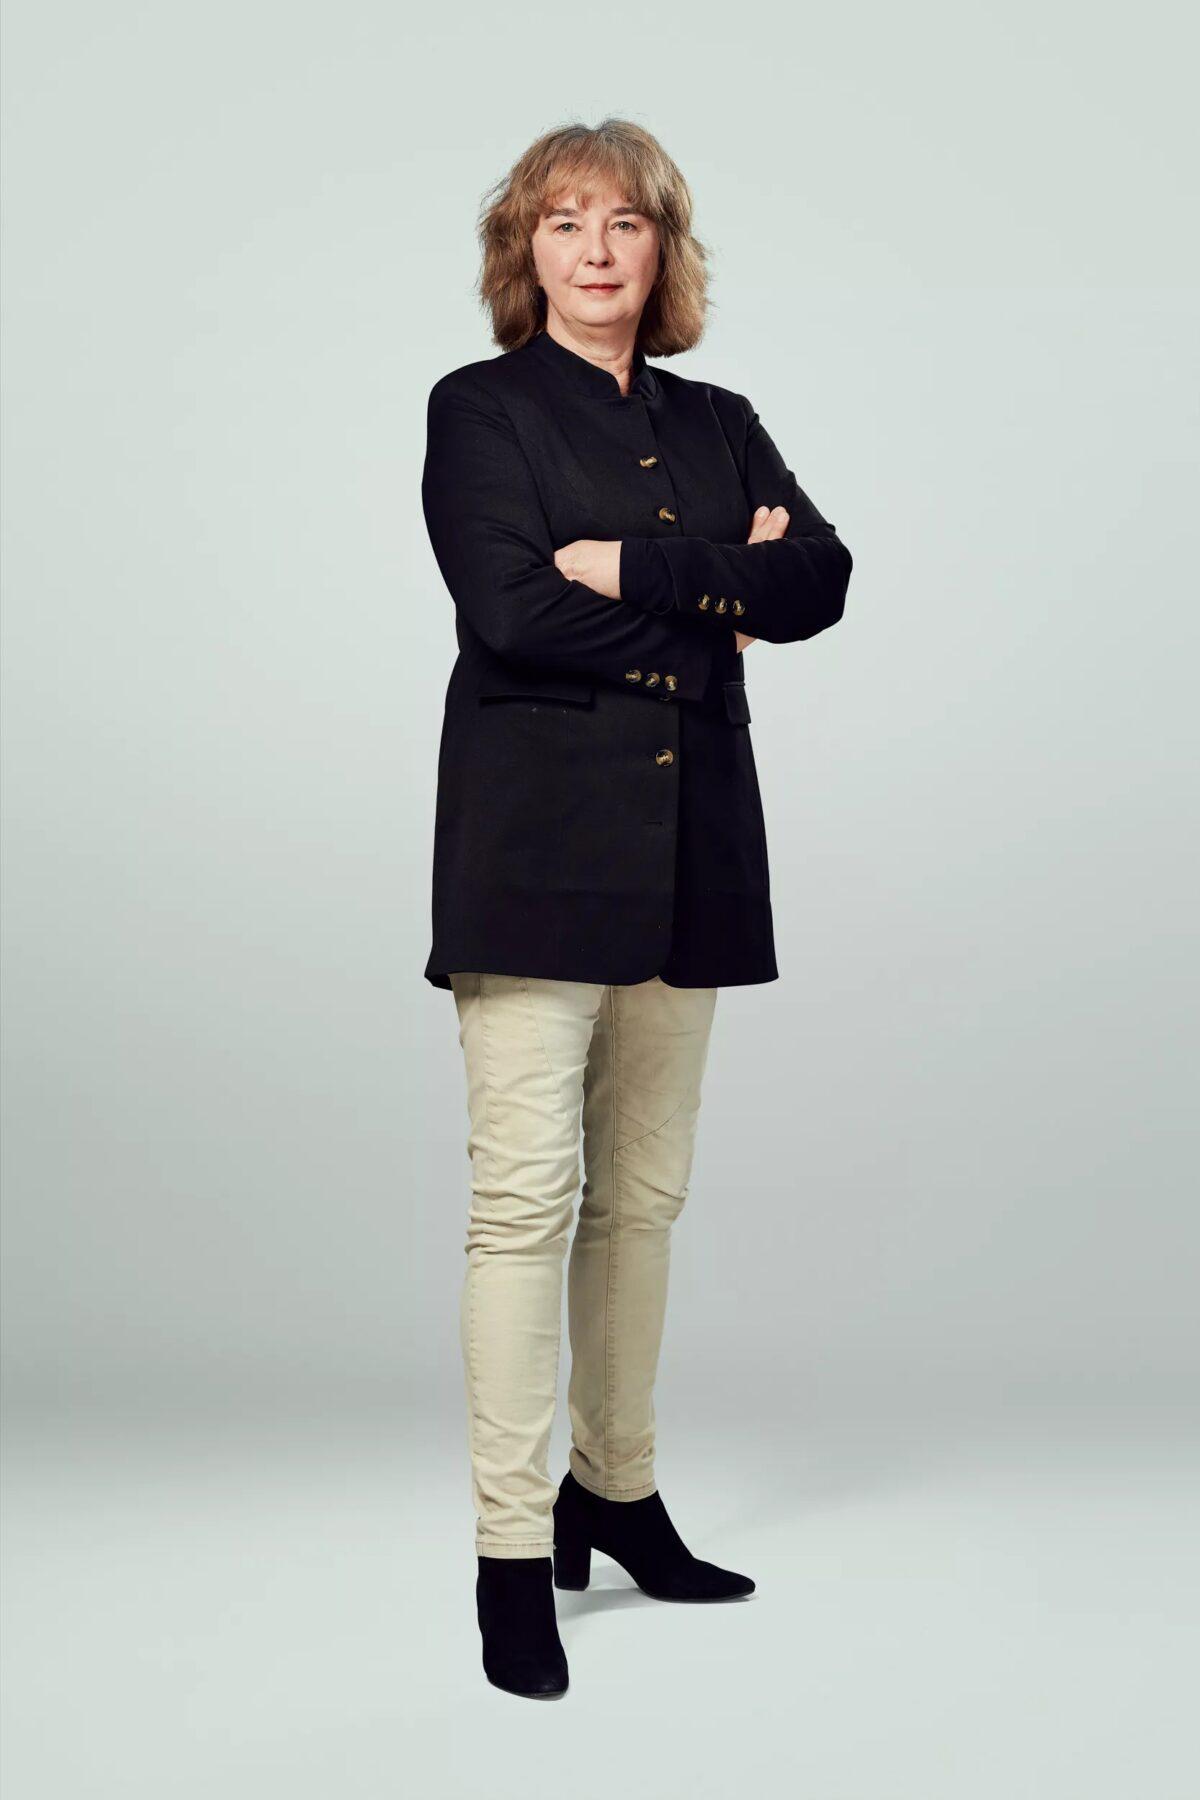 J.J.M. (Anne) Engelage